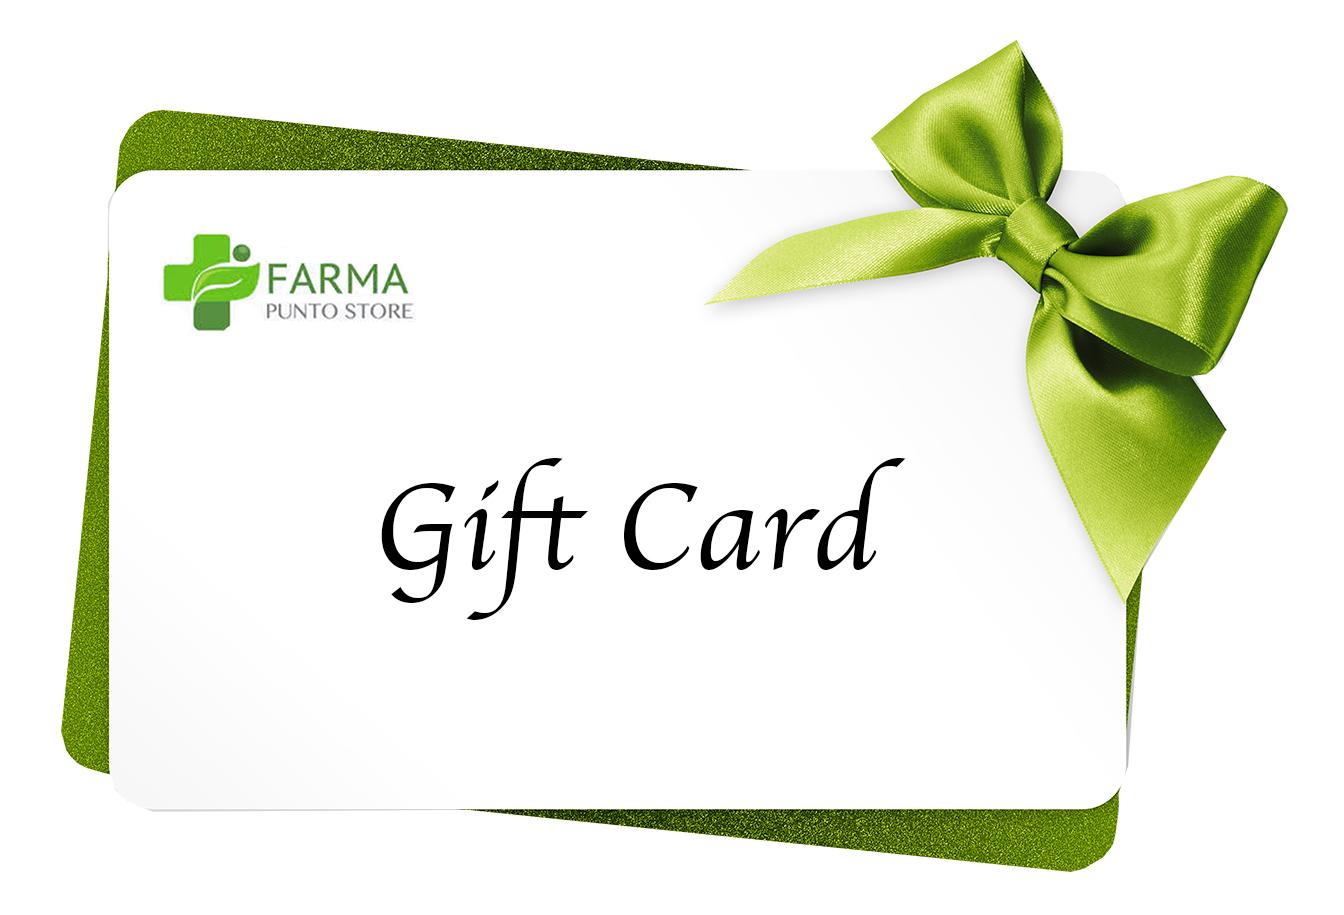 GIFT CARD FARMA PUNTO STORE